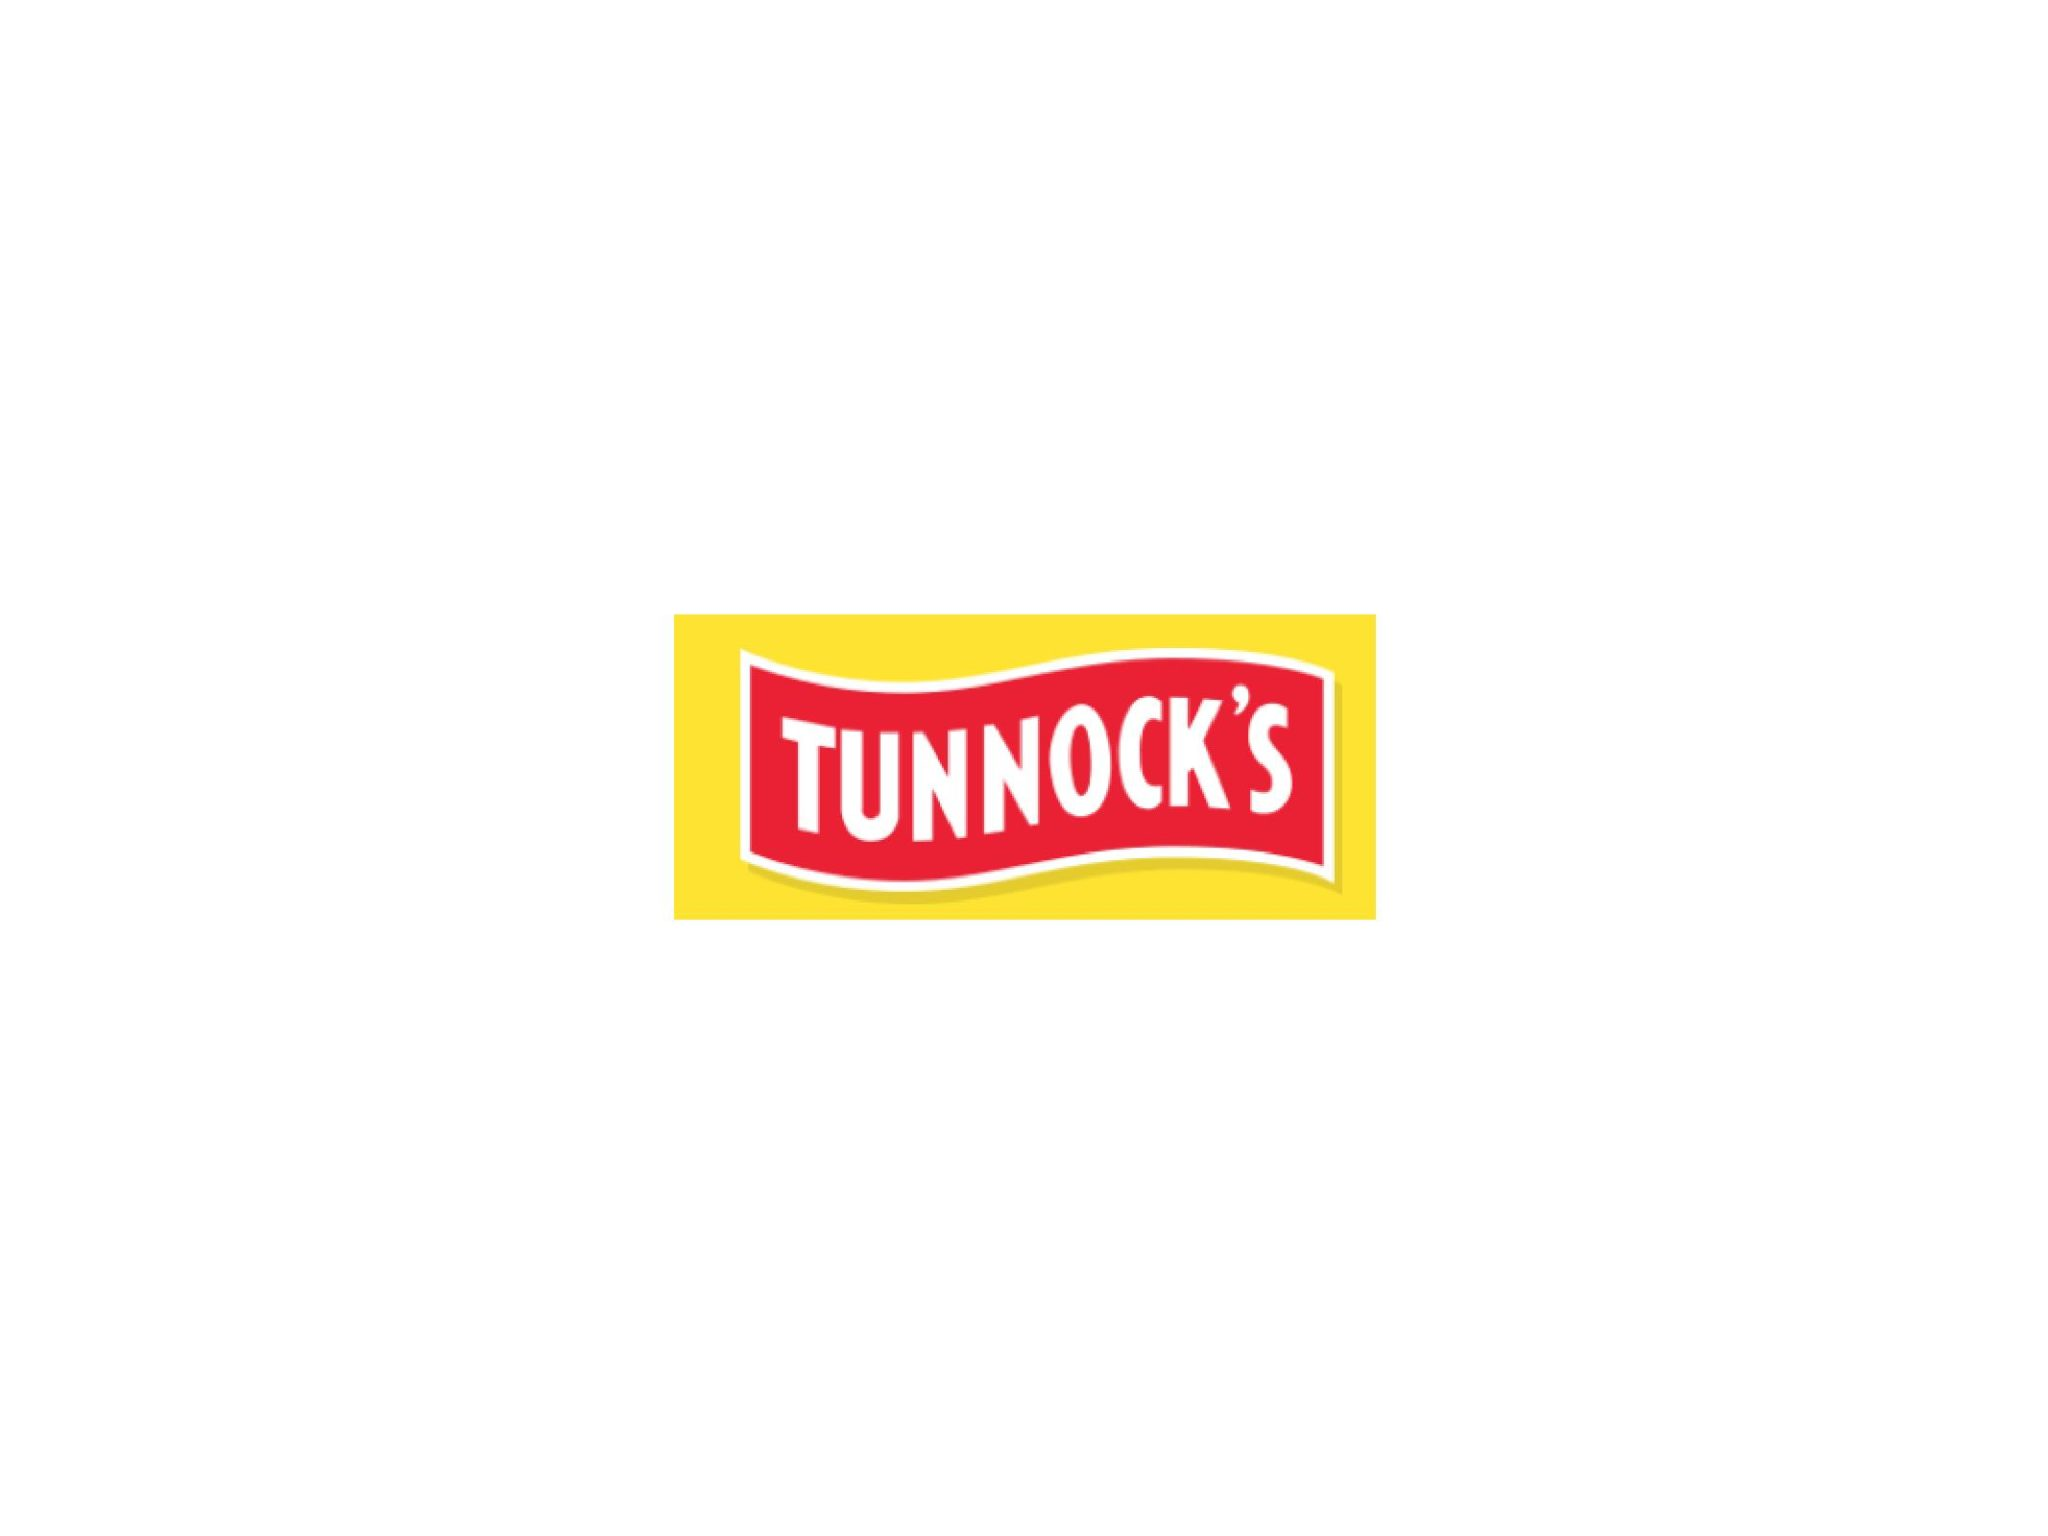 Tunnocks-page-001